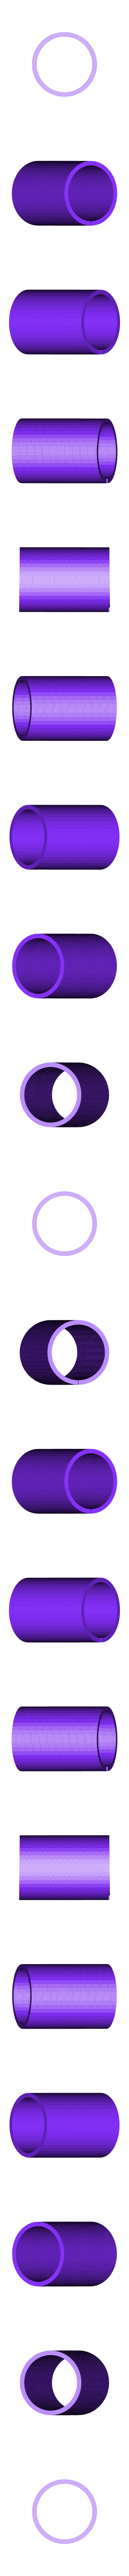 CircleSlinky.stl Download free STL file Slinkies • Template to 3D print, Ristrorg